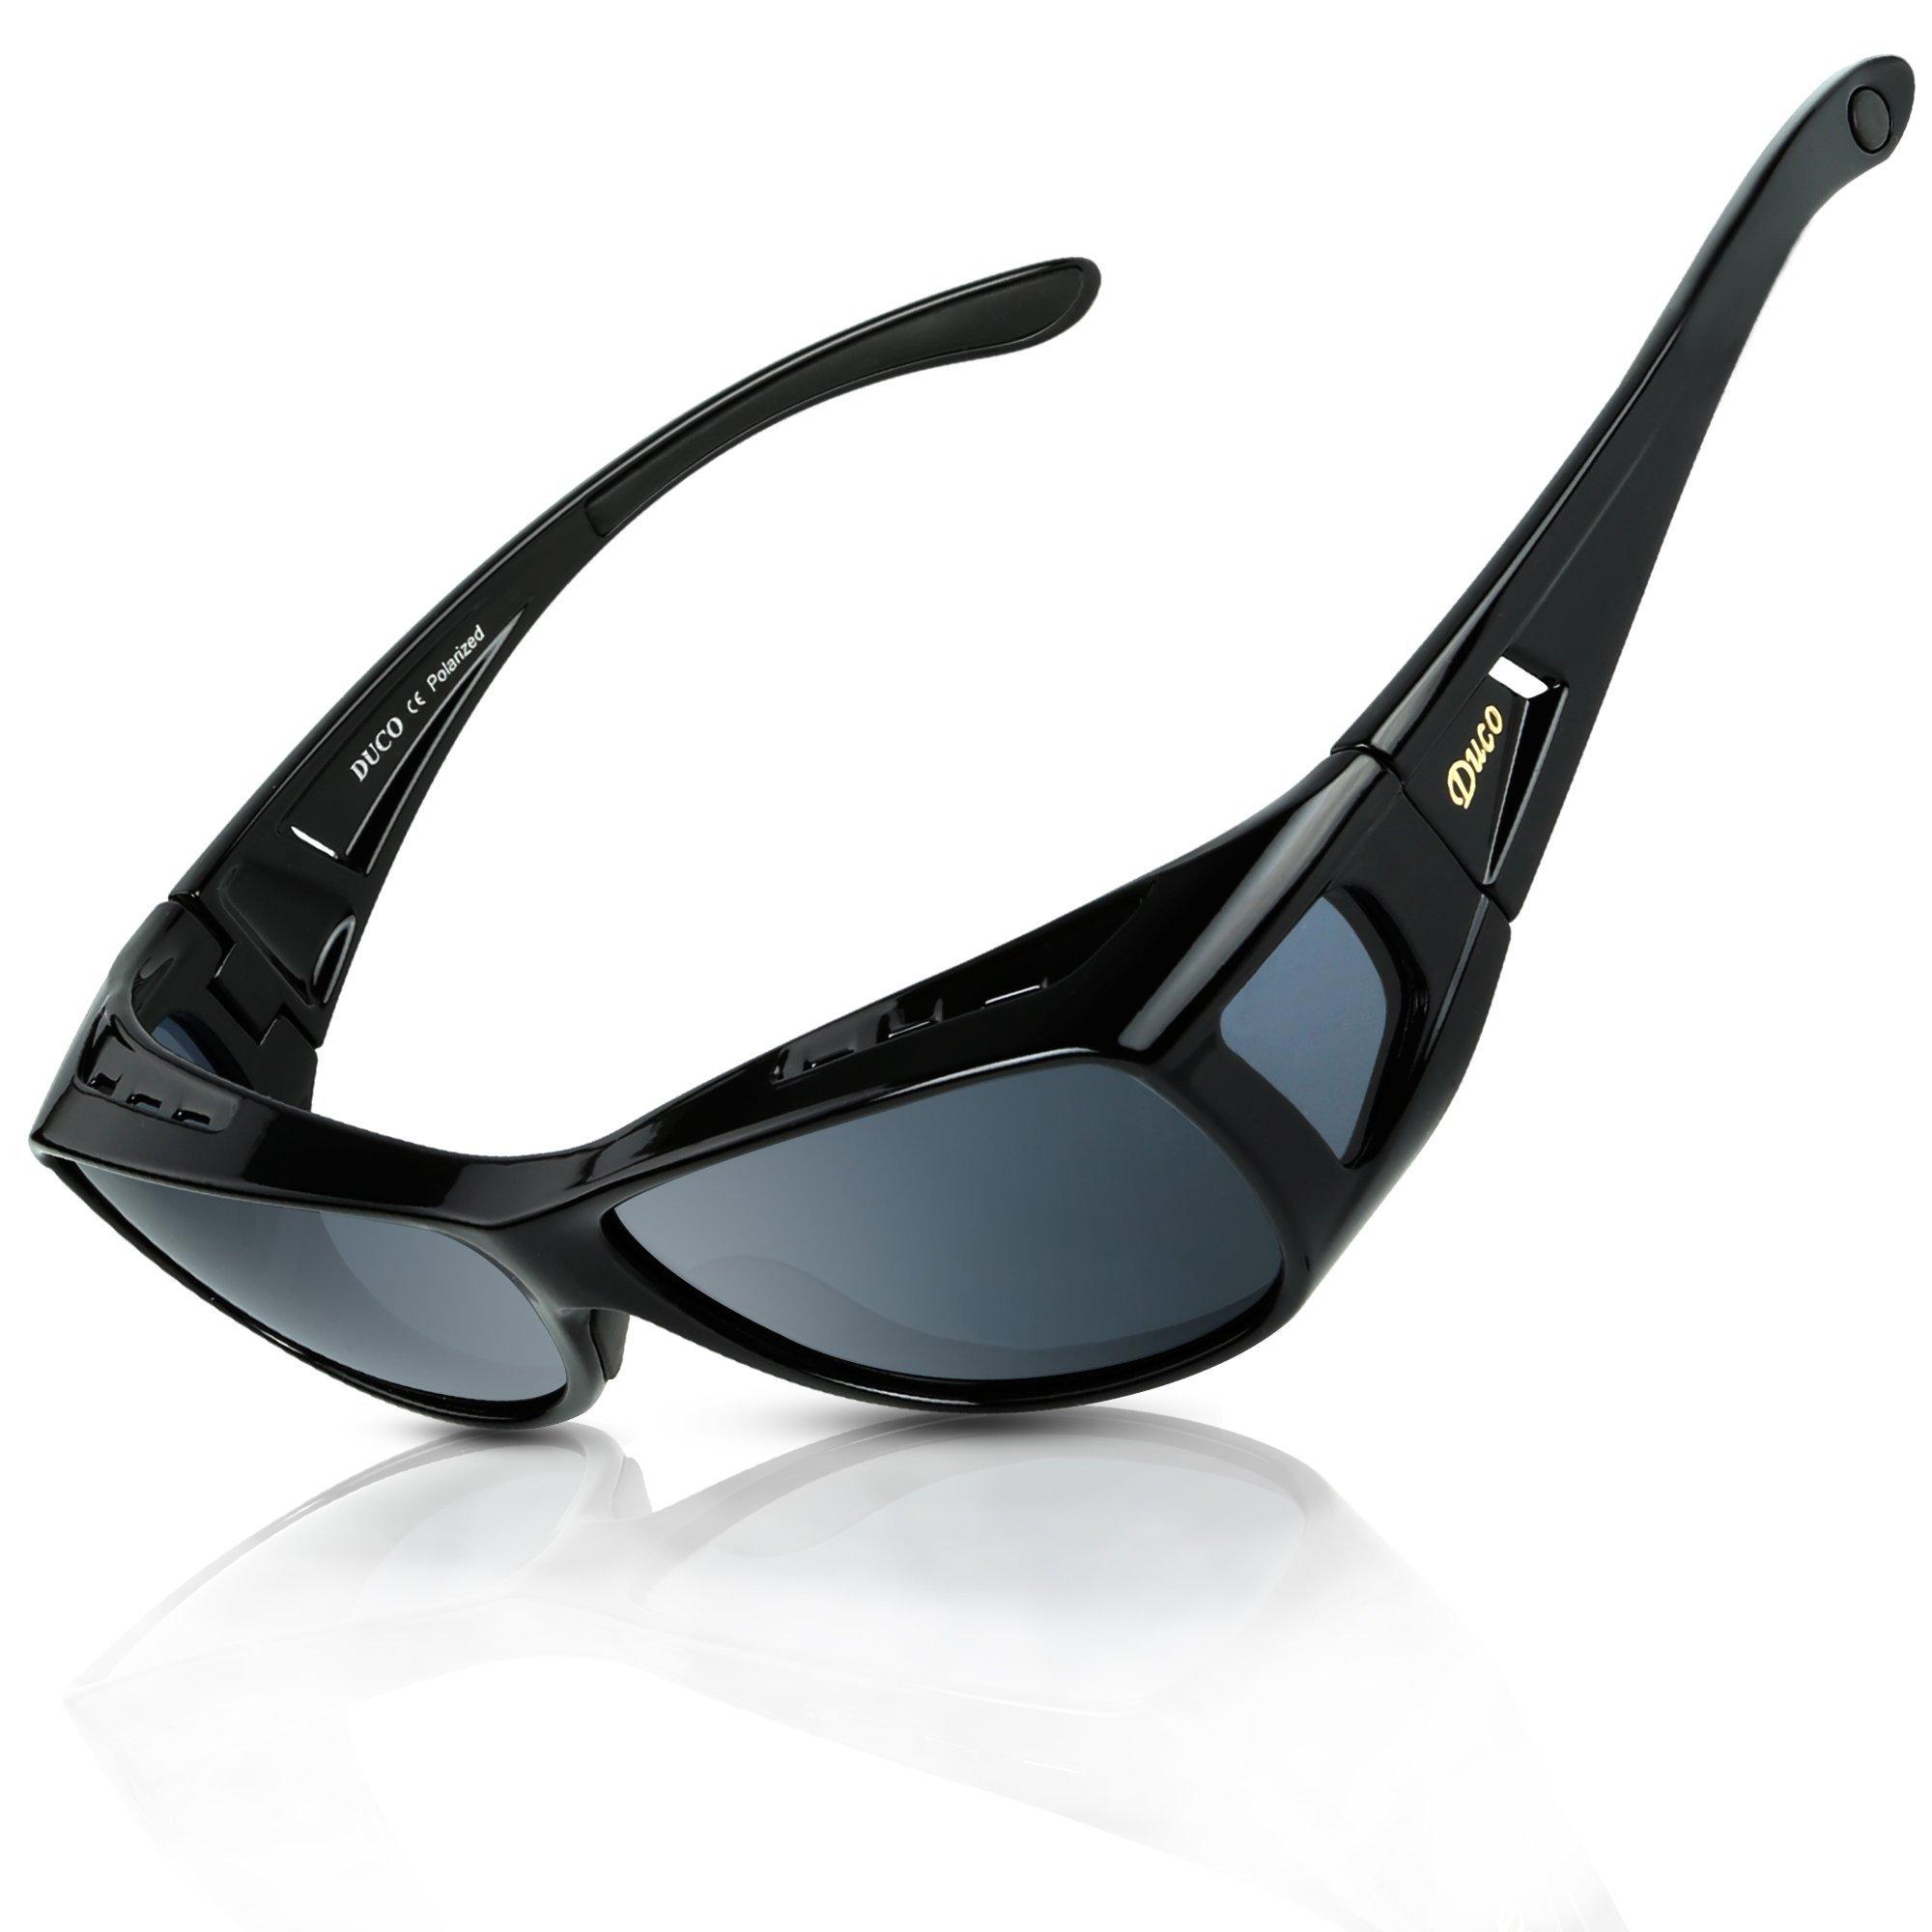 5c27c87acc0 DUCO Men s and Women s Polarised Wrap Around Fit-Over Sunglasses over  Prescription Glasses 8953 product